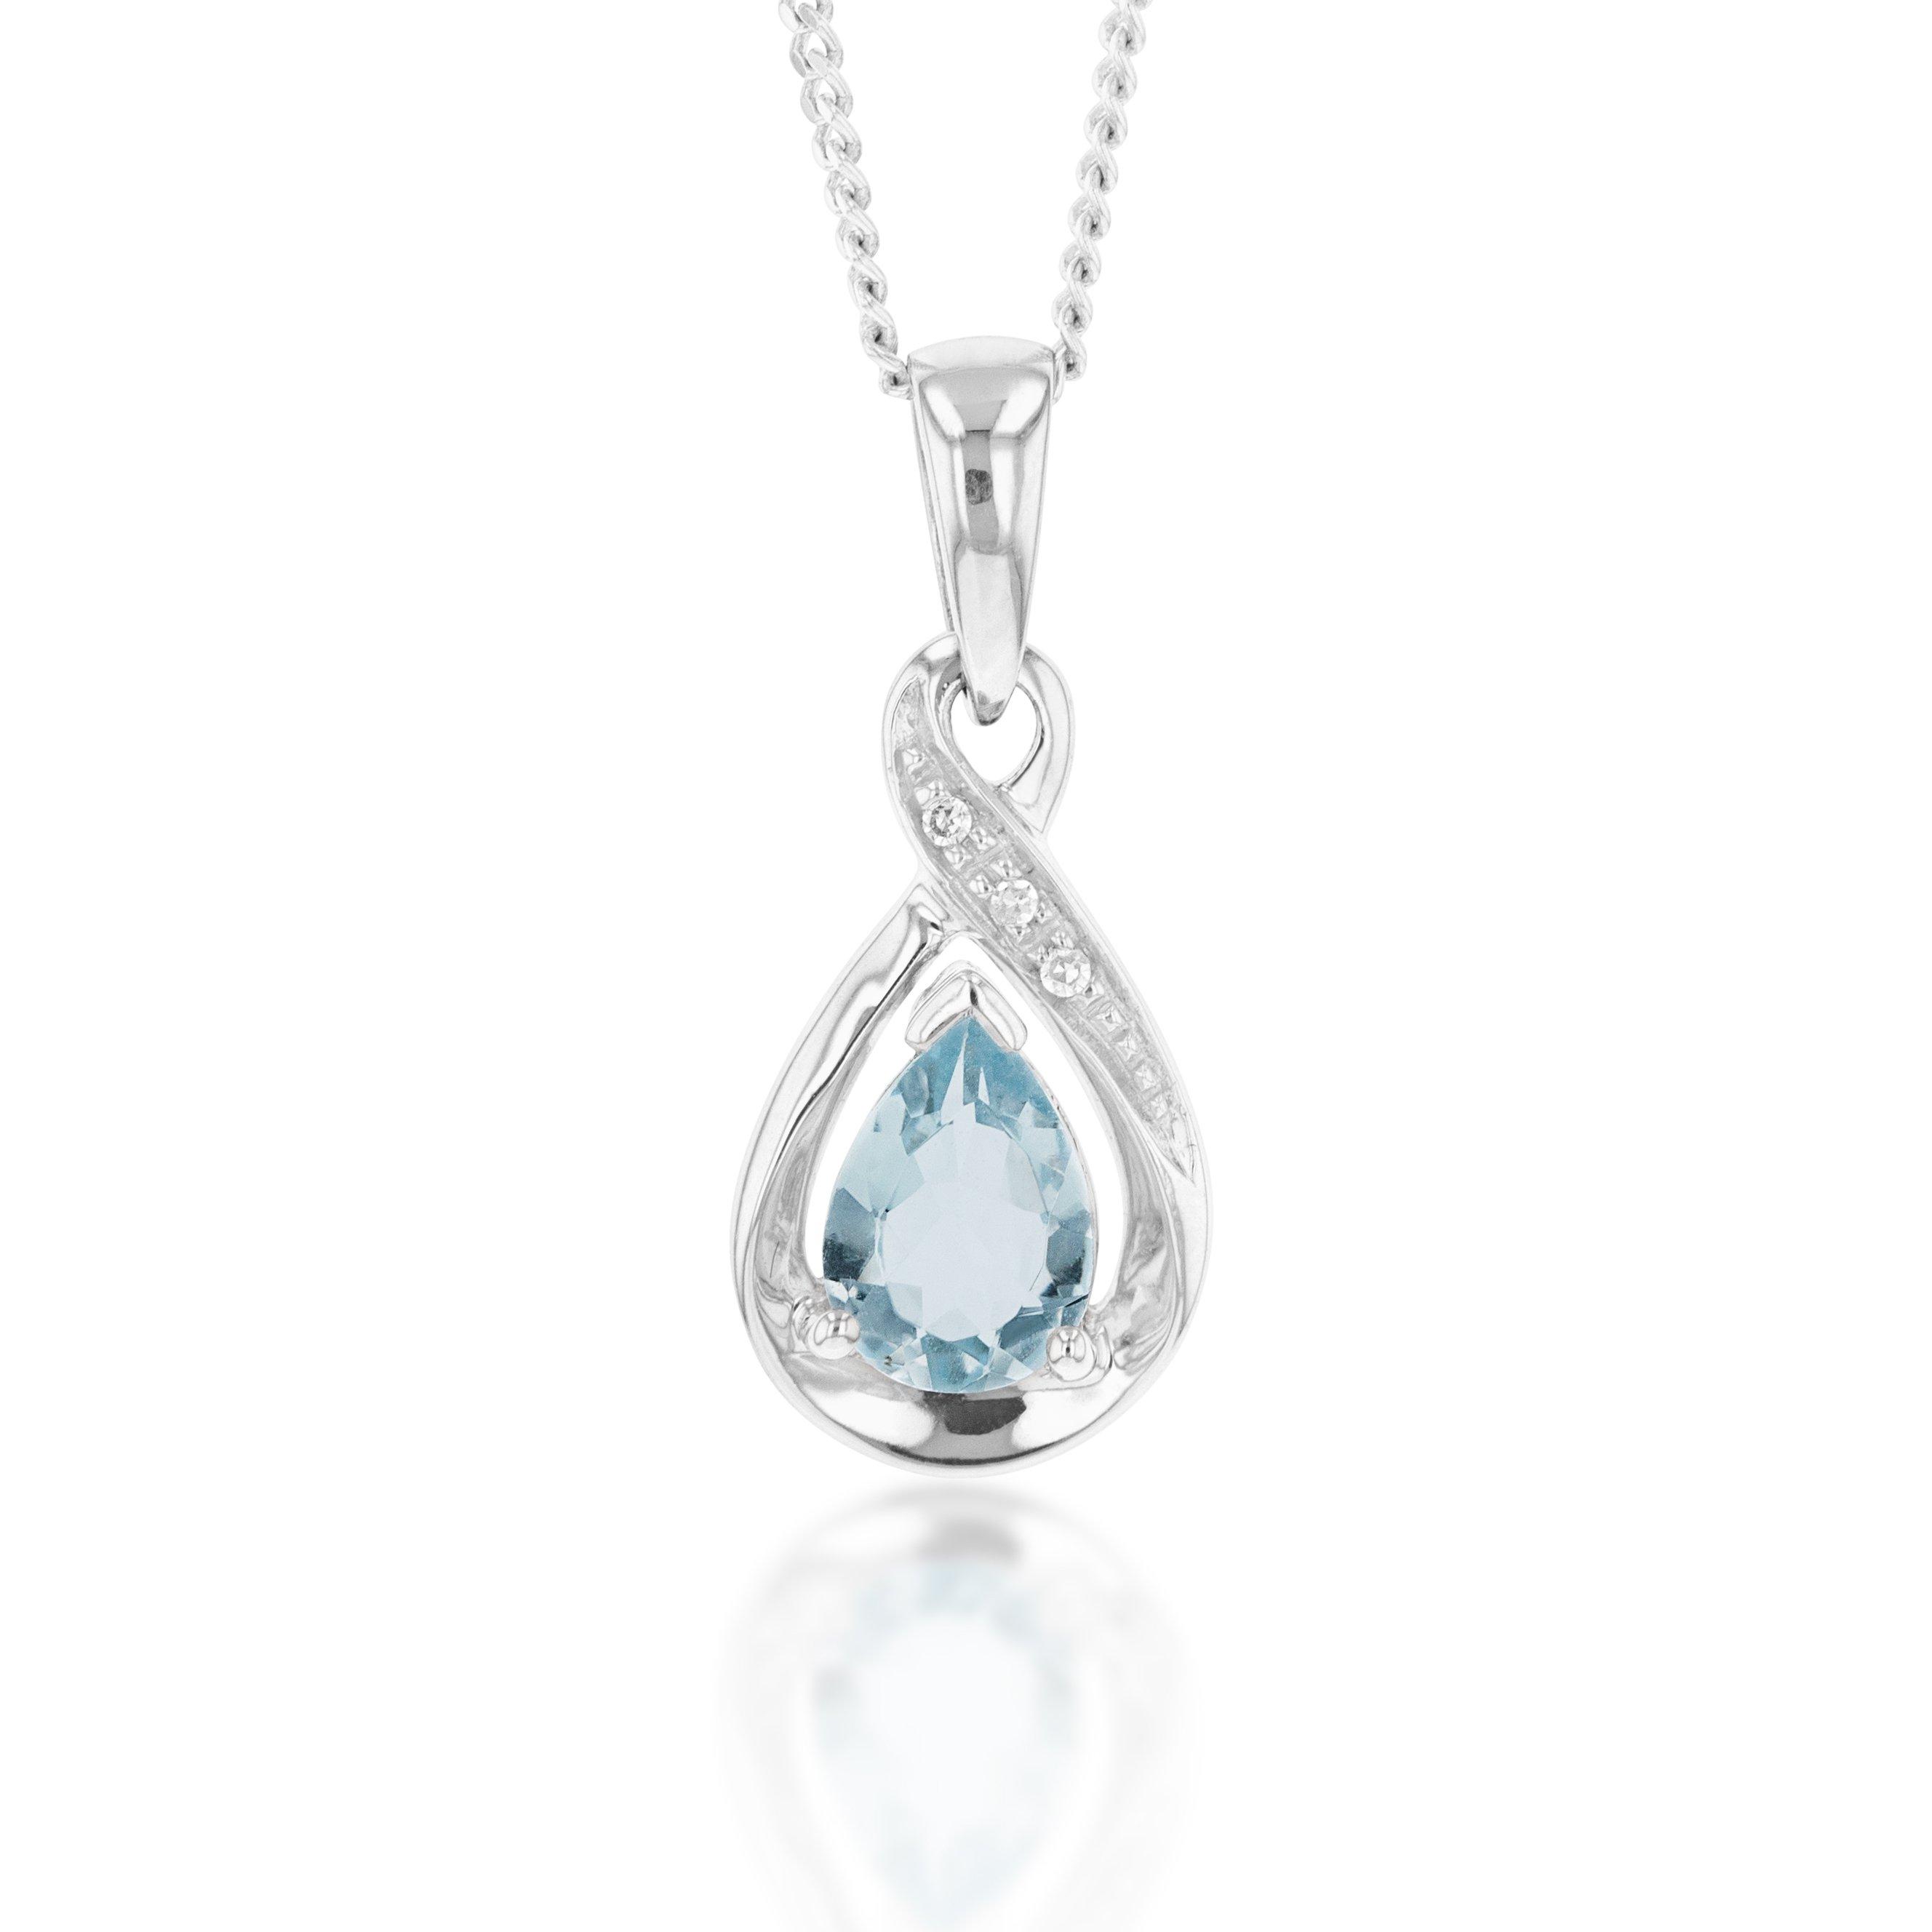 9ct White Gold Pear Shaped Aquamarine + Diamond Pendant